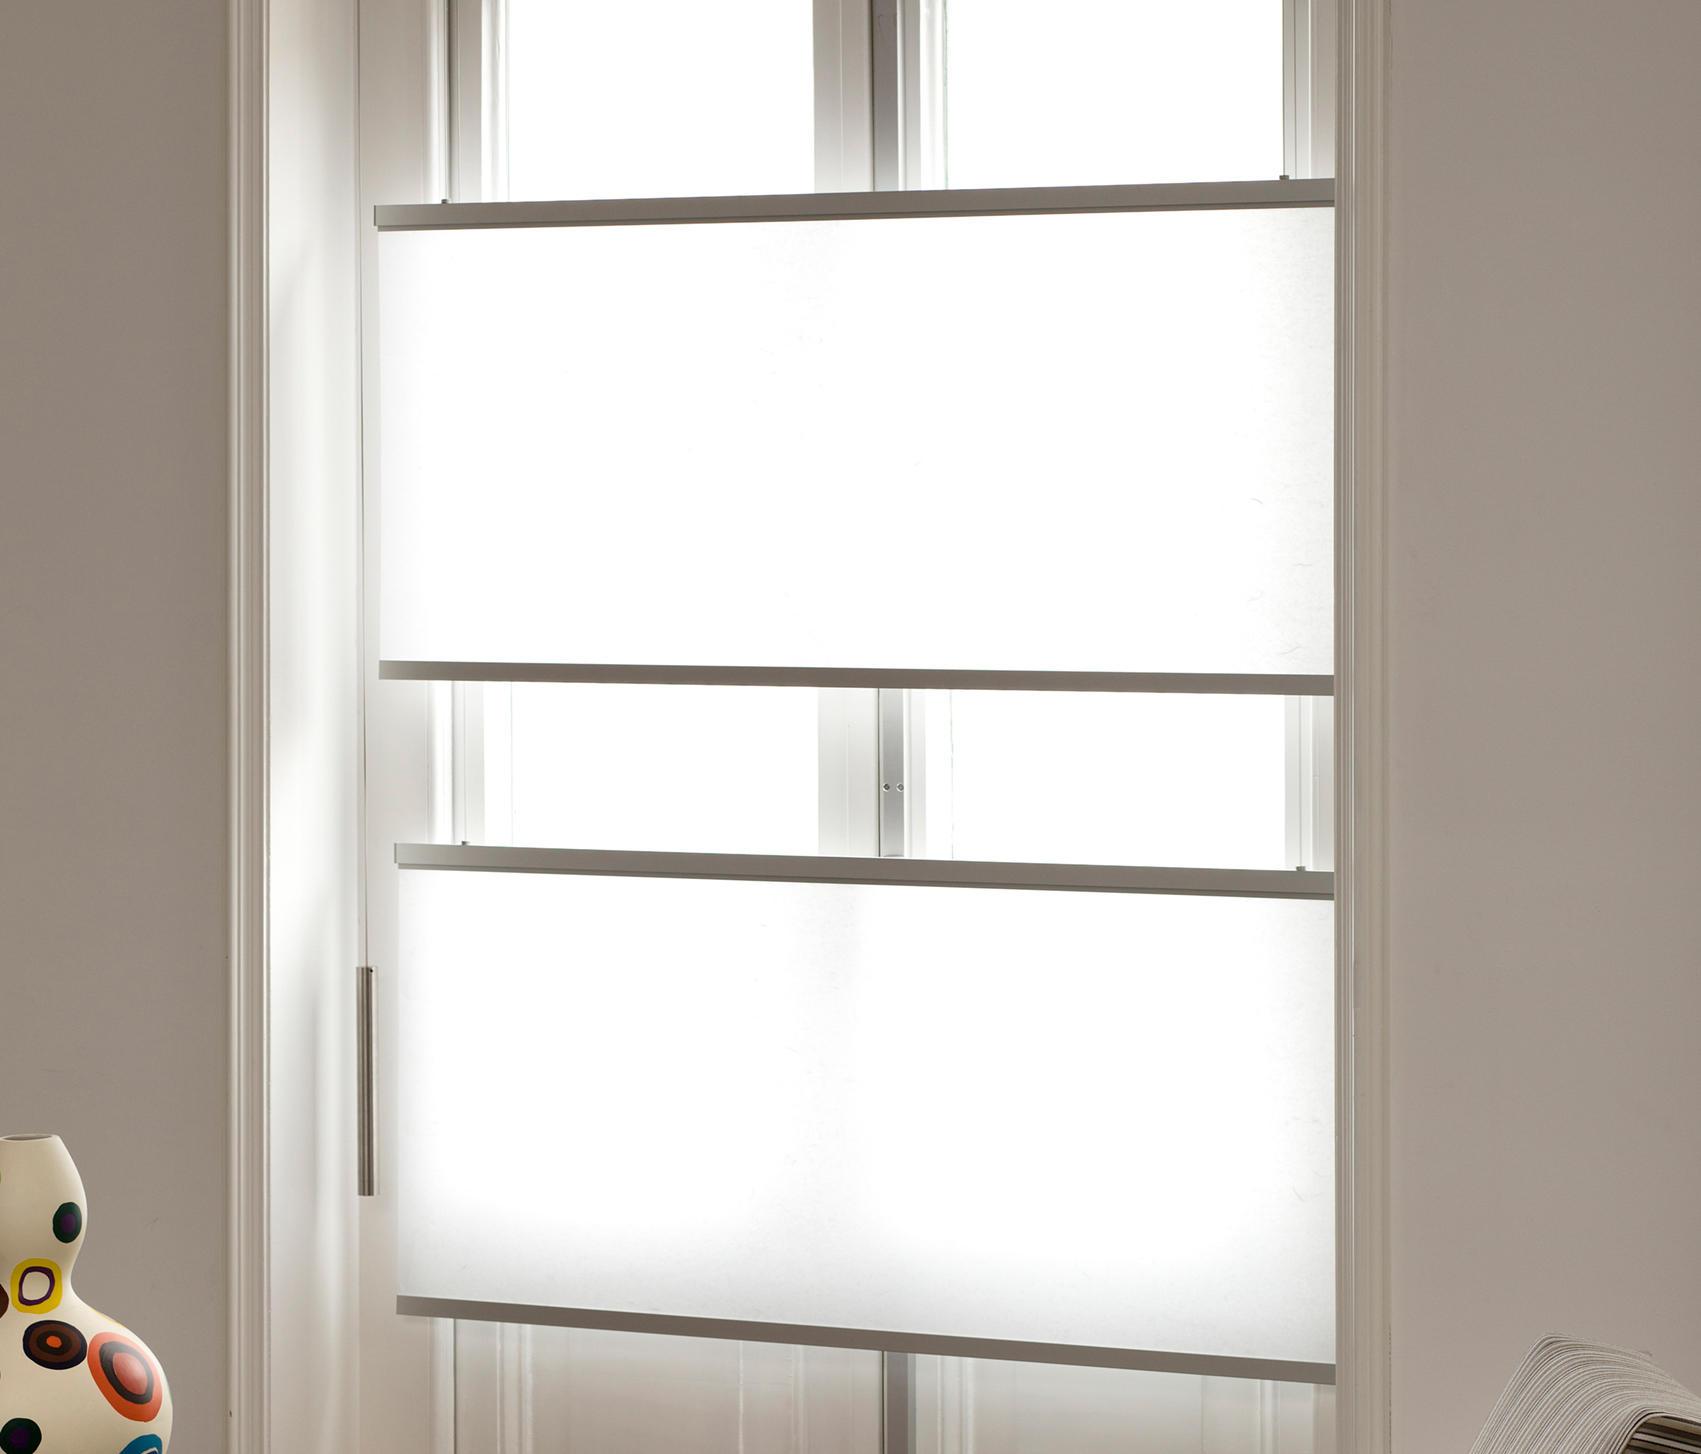 flow shades lw01 tende arricciate a cordone wood washi architonic. Black Bedroom Furniture Sets. Home Design Ideas